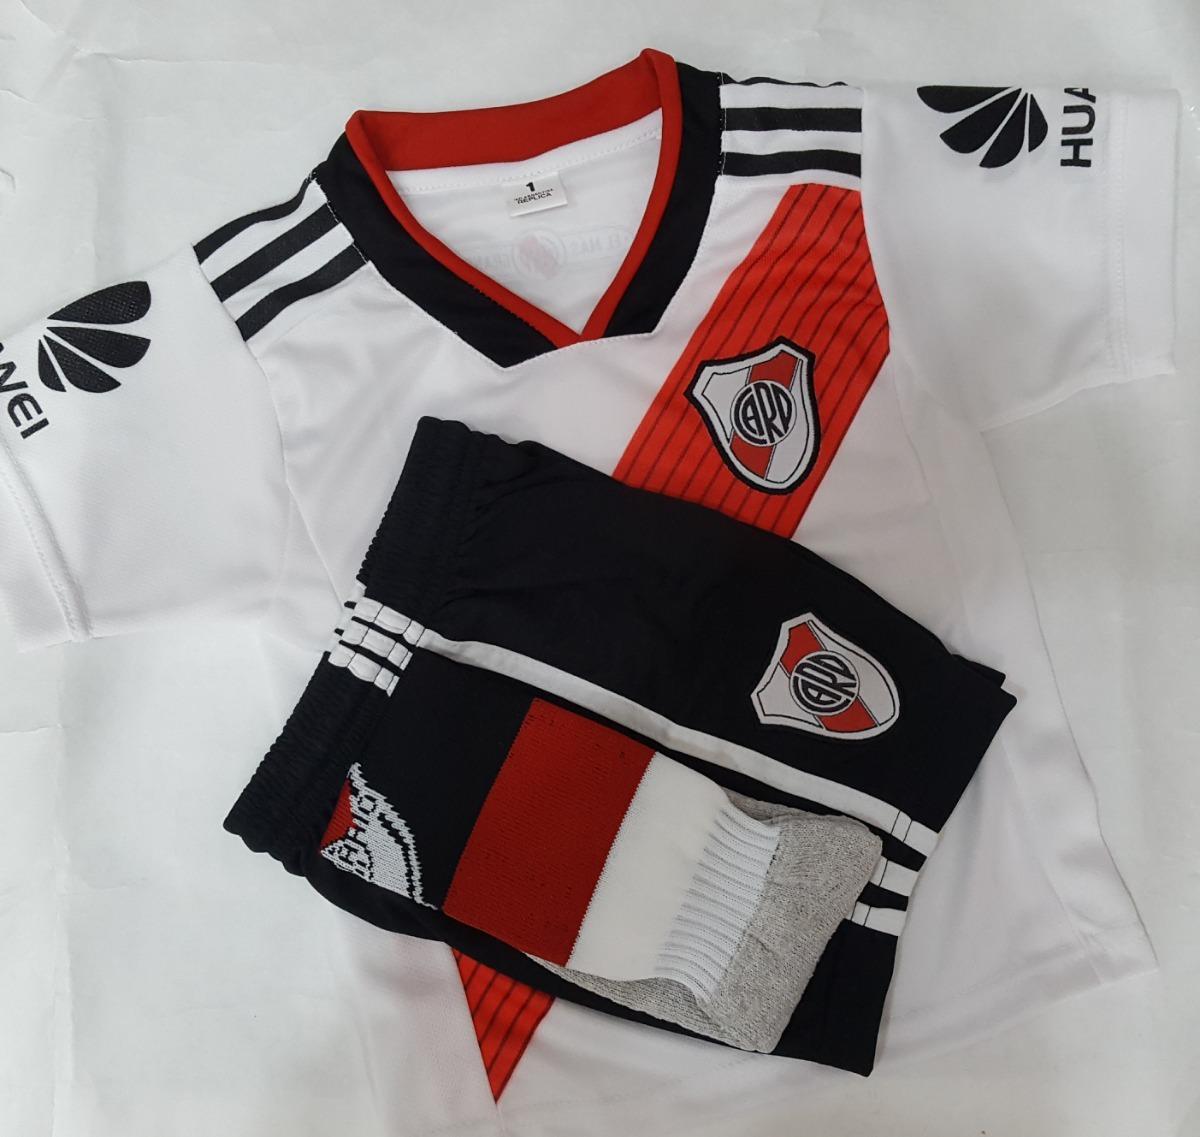 bb15e2986 Conjunto River Temporada 2018-19 Camiseta Short Y Medias -   800